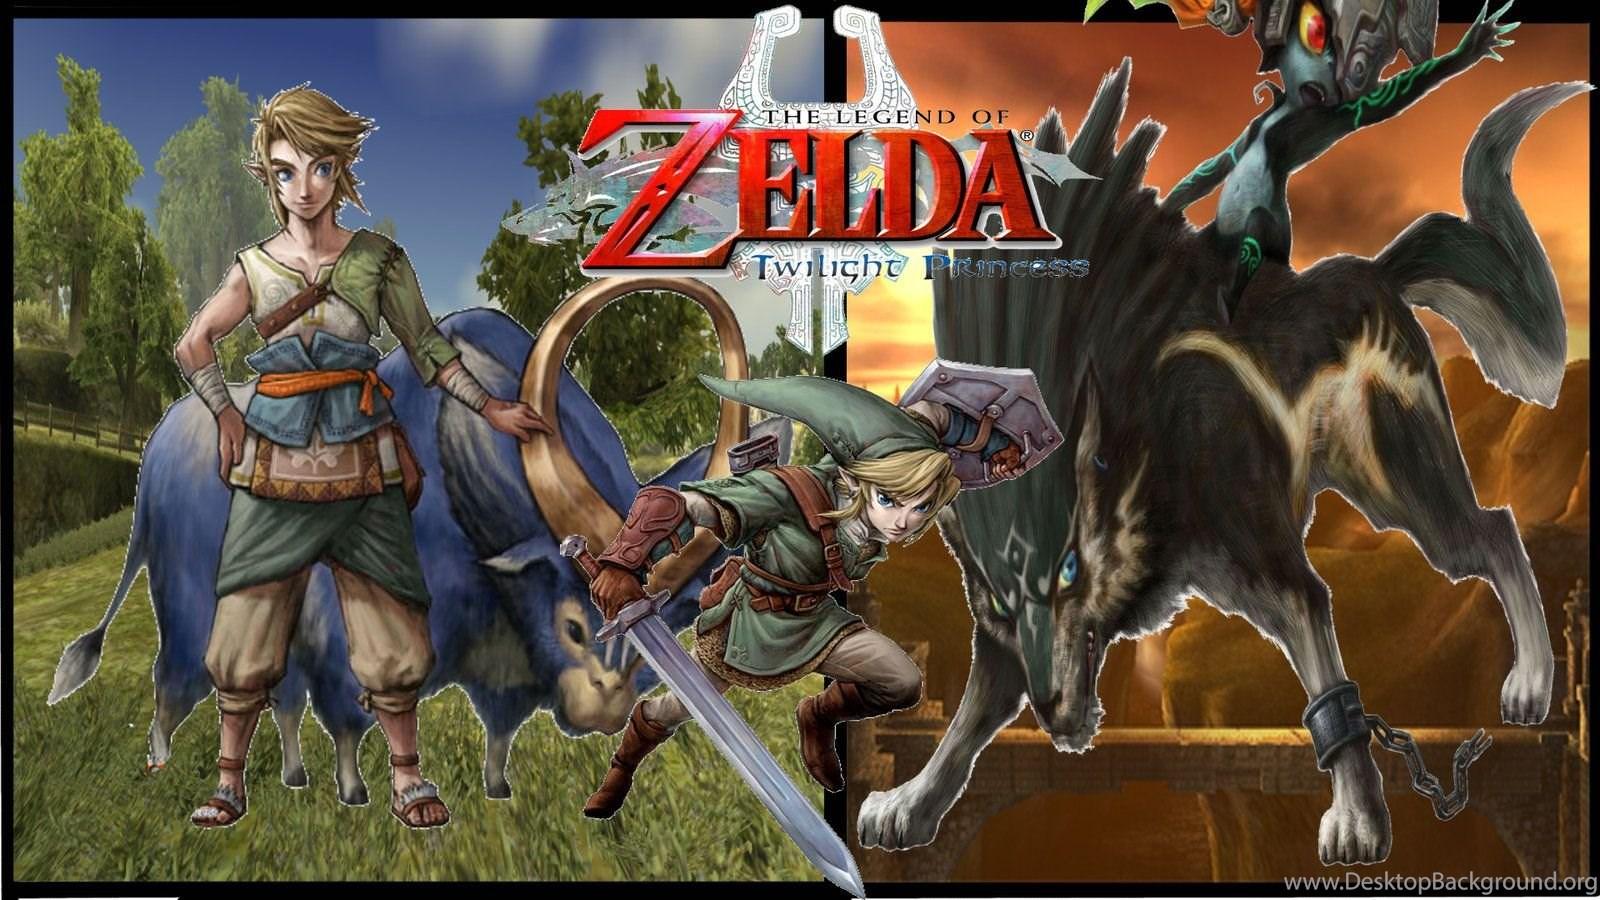 Zelda Twilight Princess Wallpapers 1 By Gg231 On Deviantart